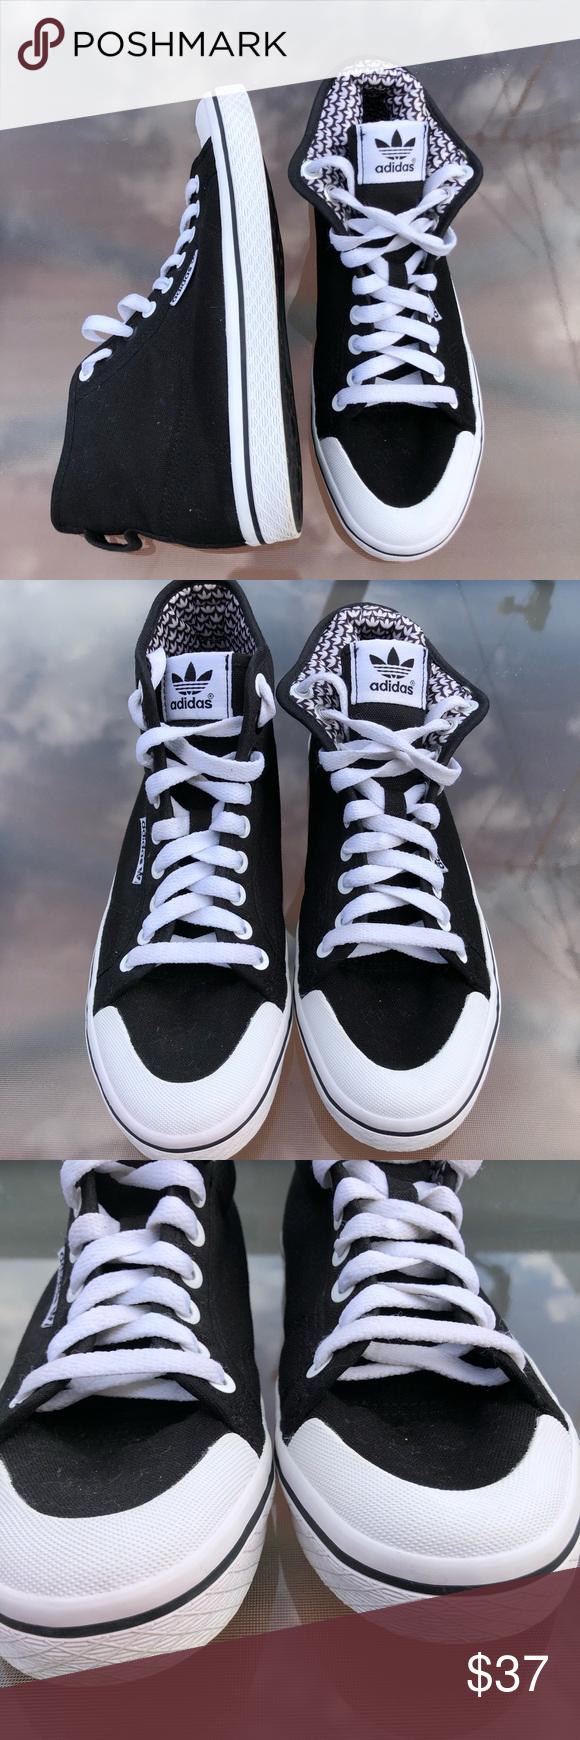 adidas honey mid nere